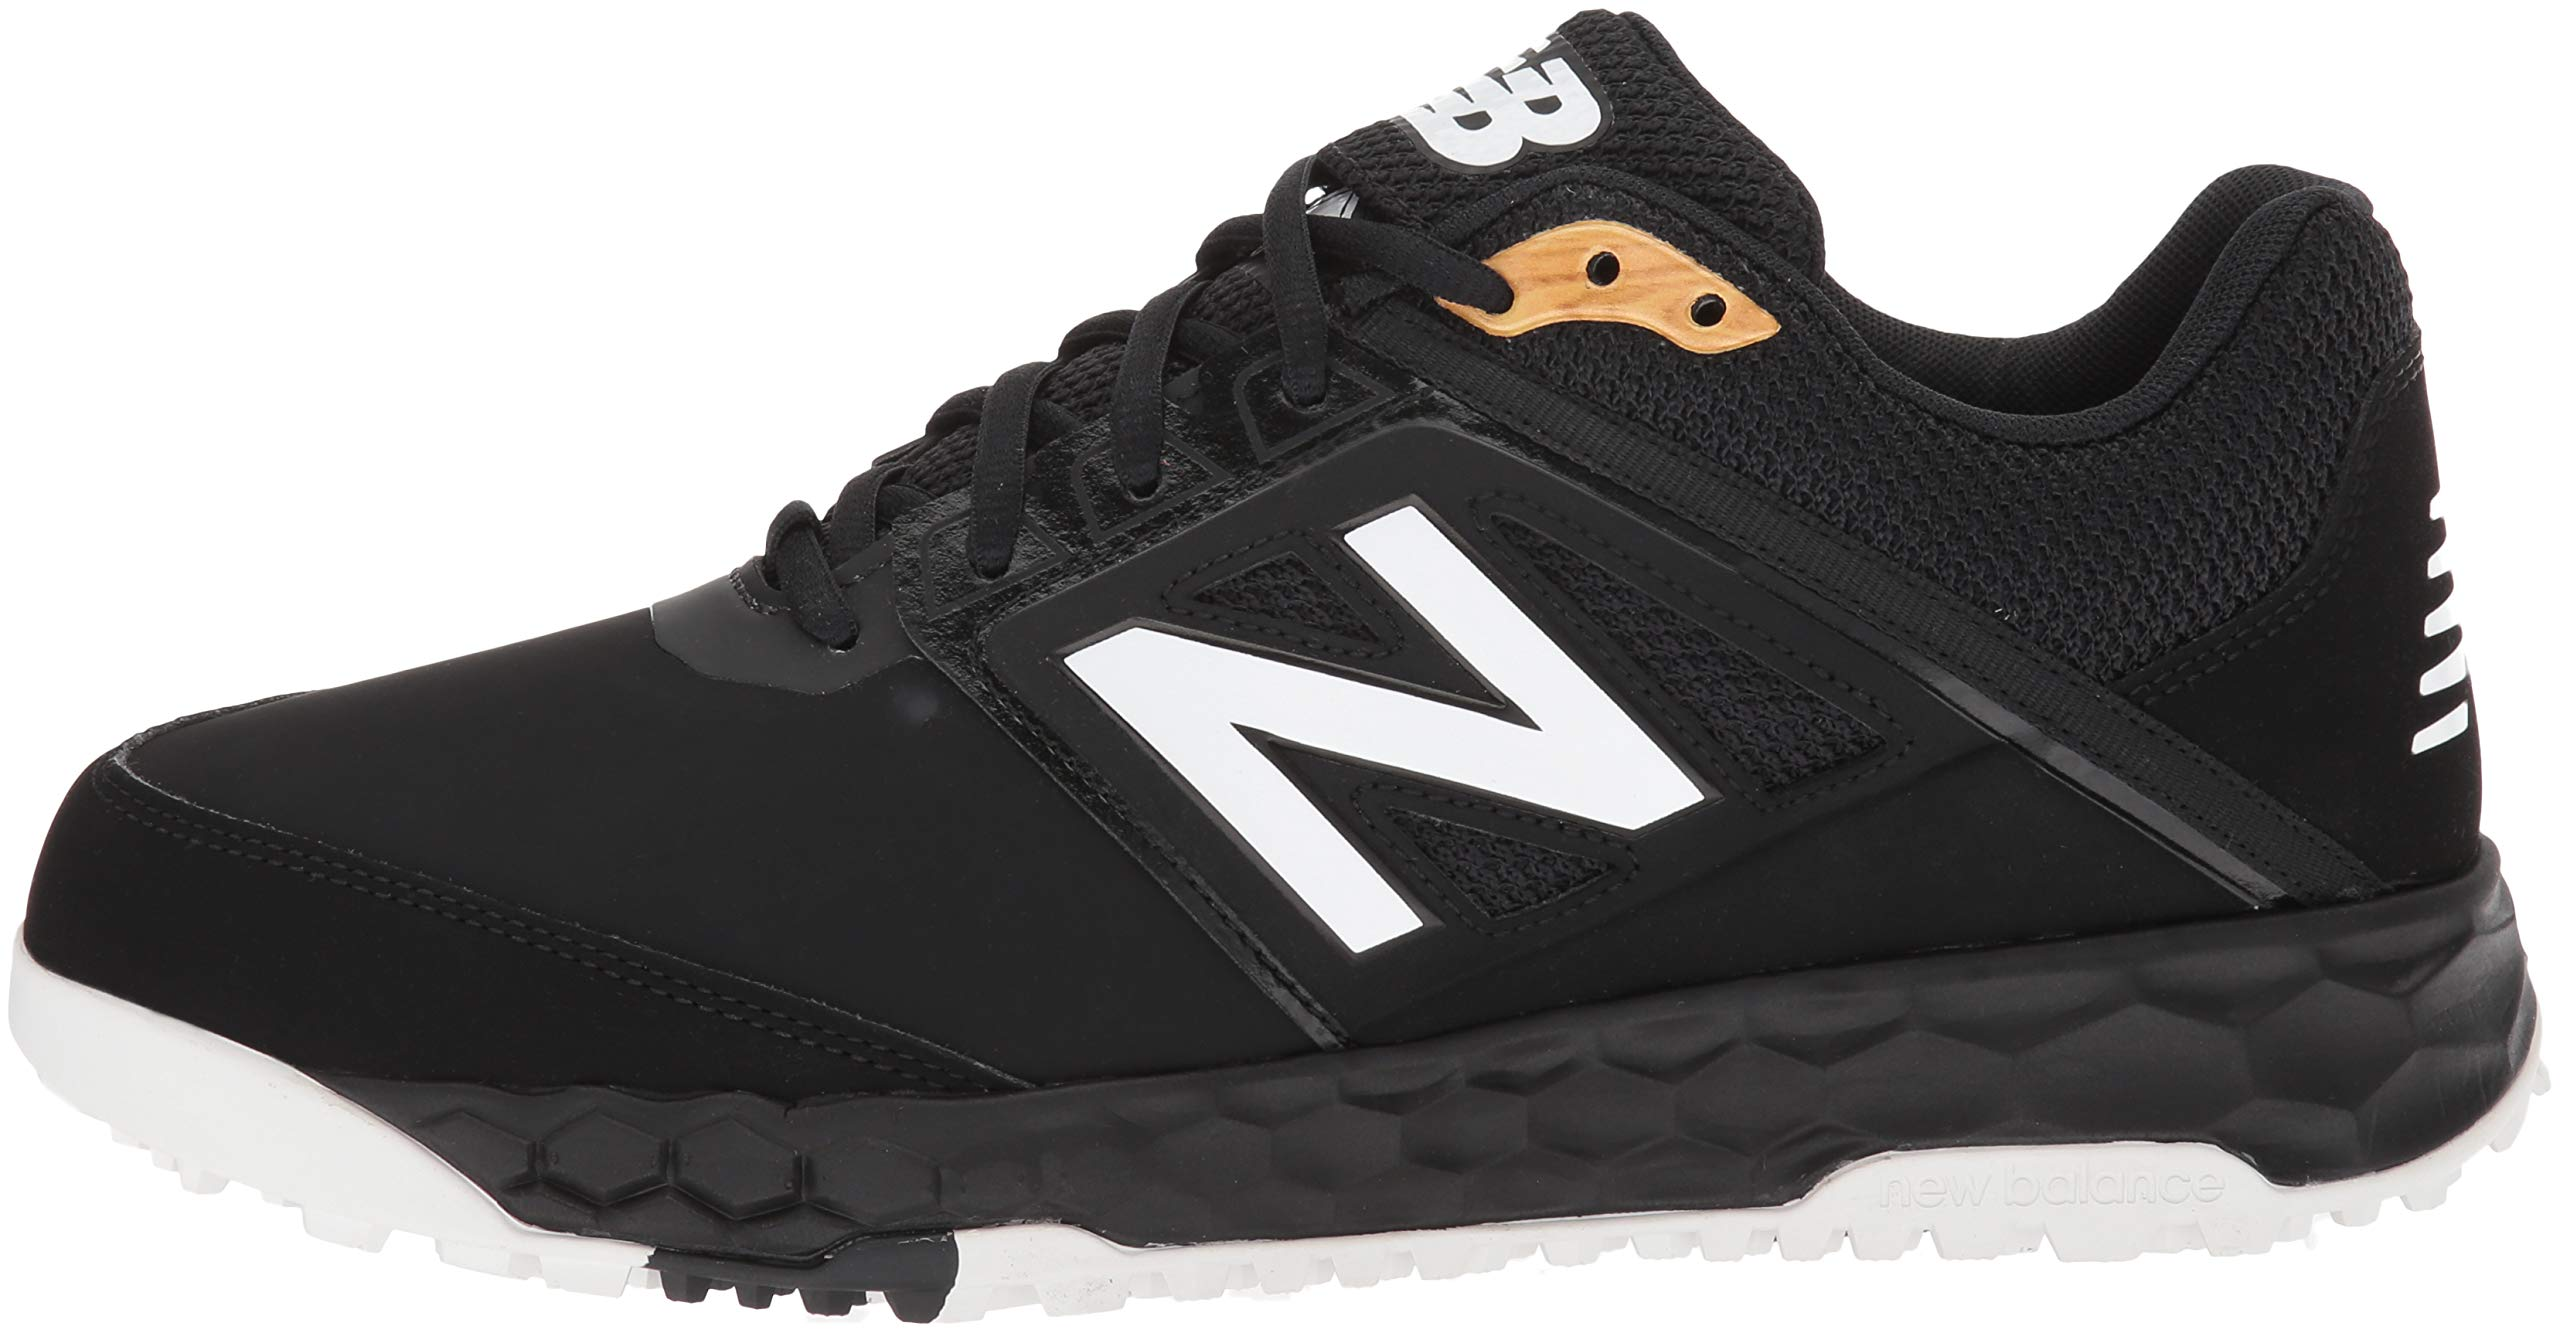 New Balance Men's 3000v4 Turf Baseball Shoe, Black, 5 D US by New Balance (Image #5)